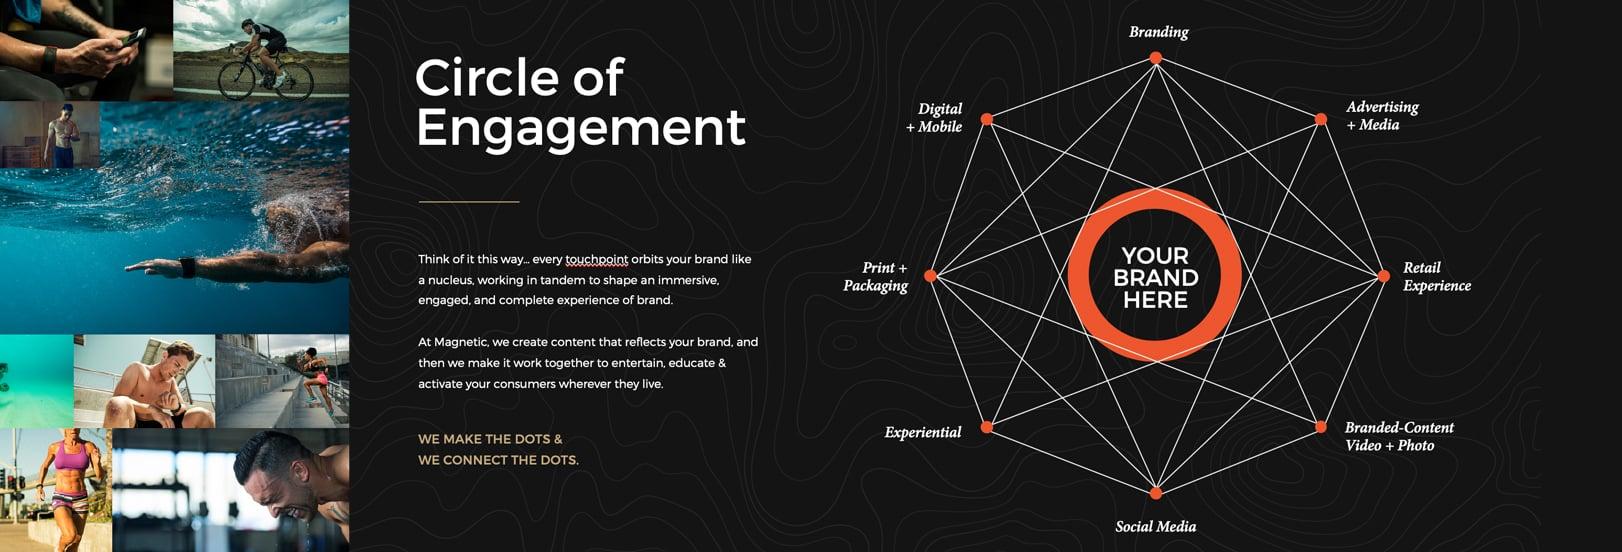 circle of engagement diagram